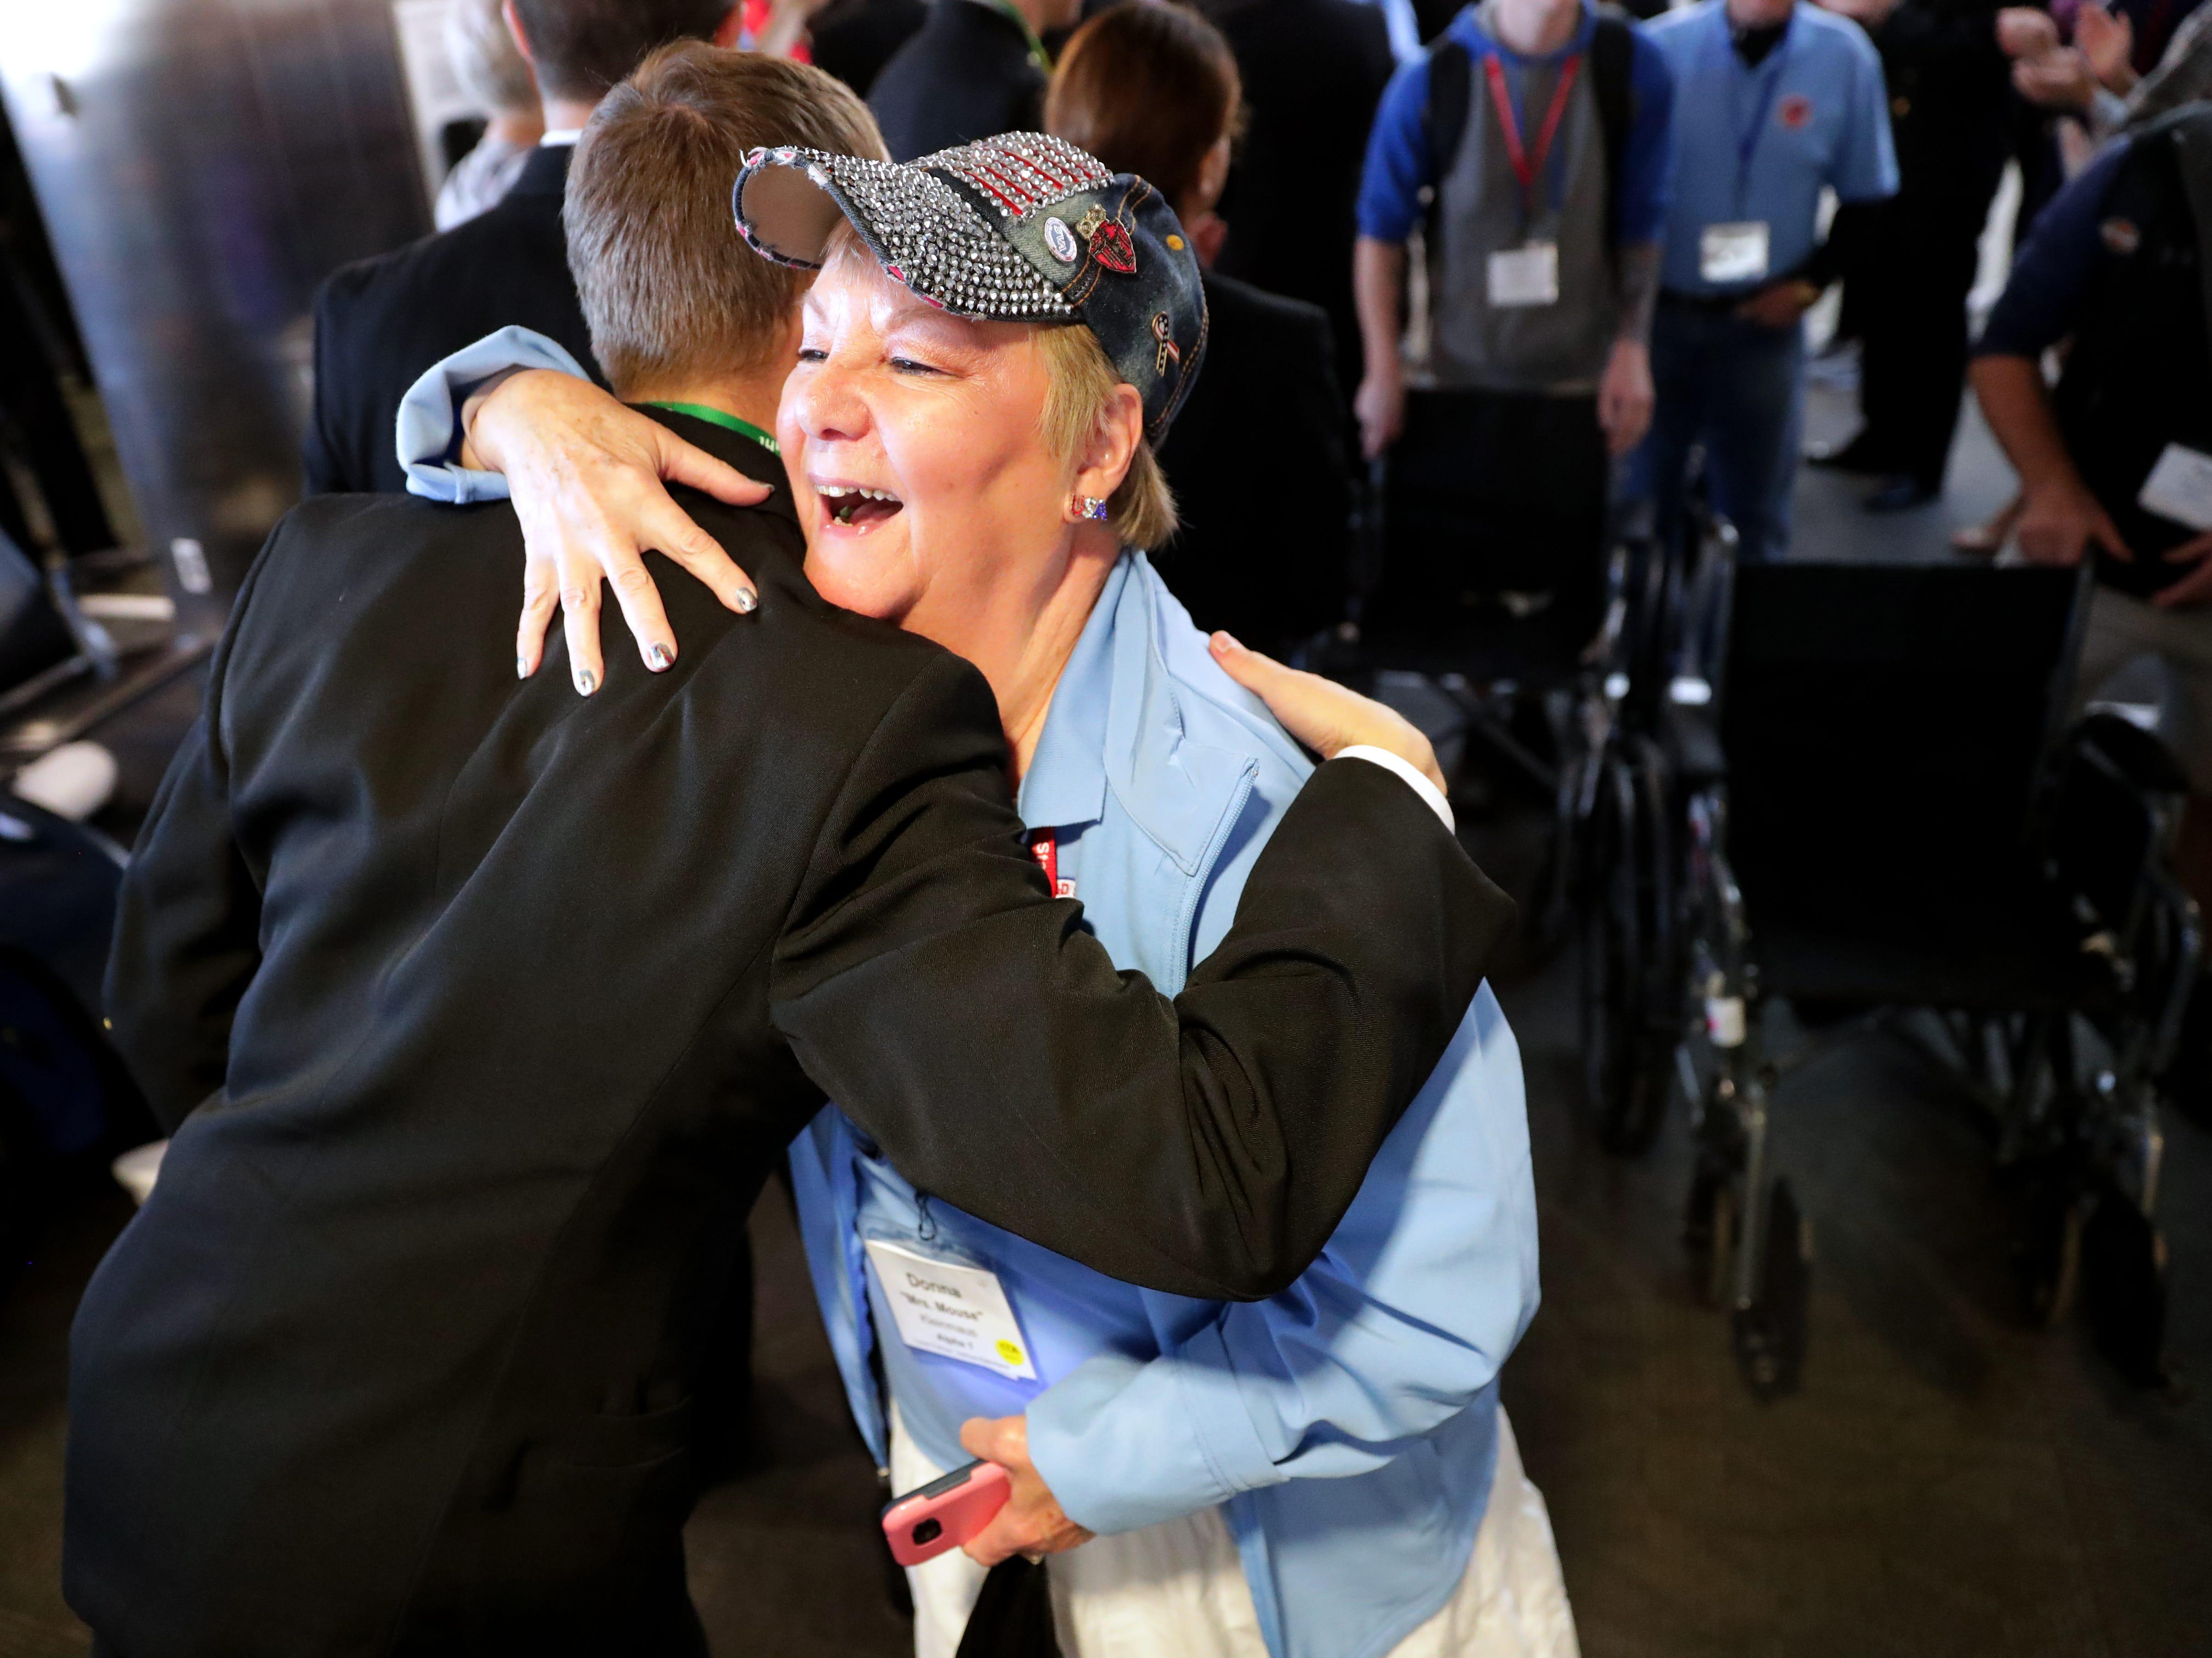 Vietnam veteran Donna Kleinmaus of West Bend hugs a midshipman after getting off the plane in Baltimore.  She flew with her husband, John Kleinmaus, also a Vietnam veteran.